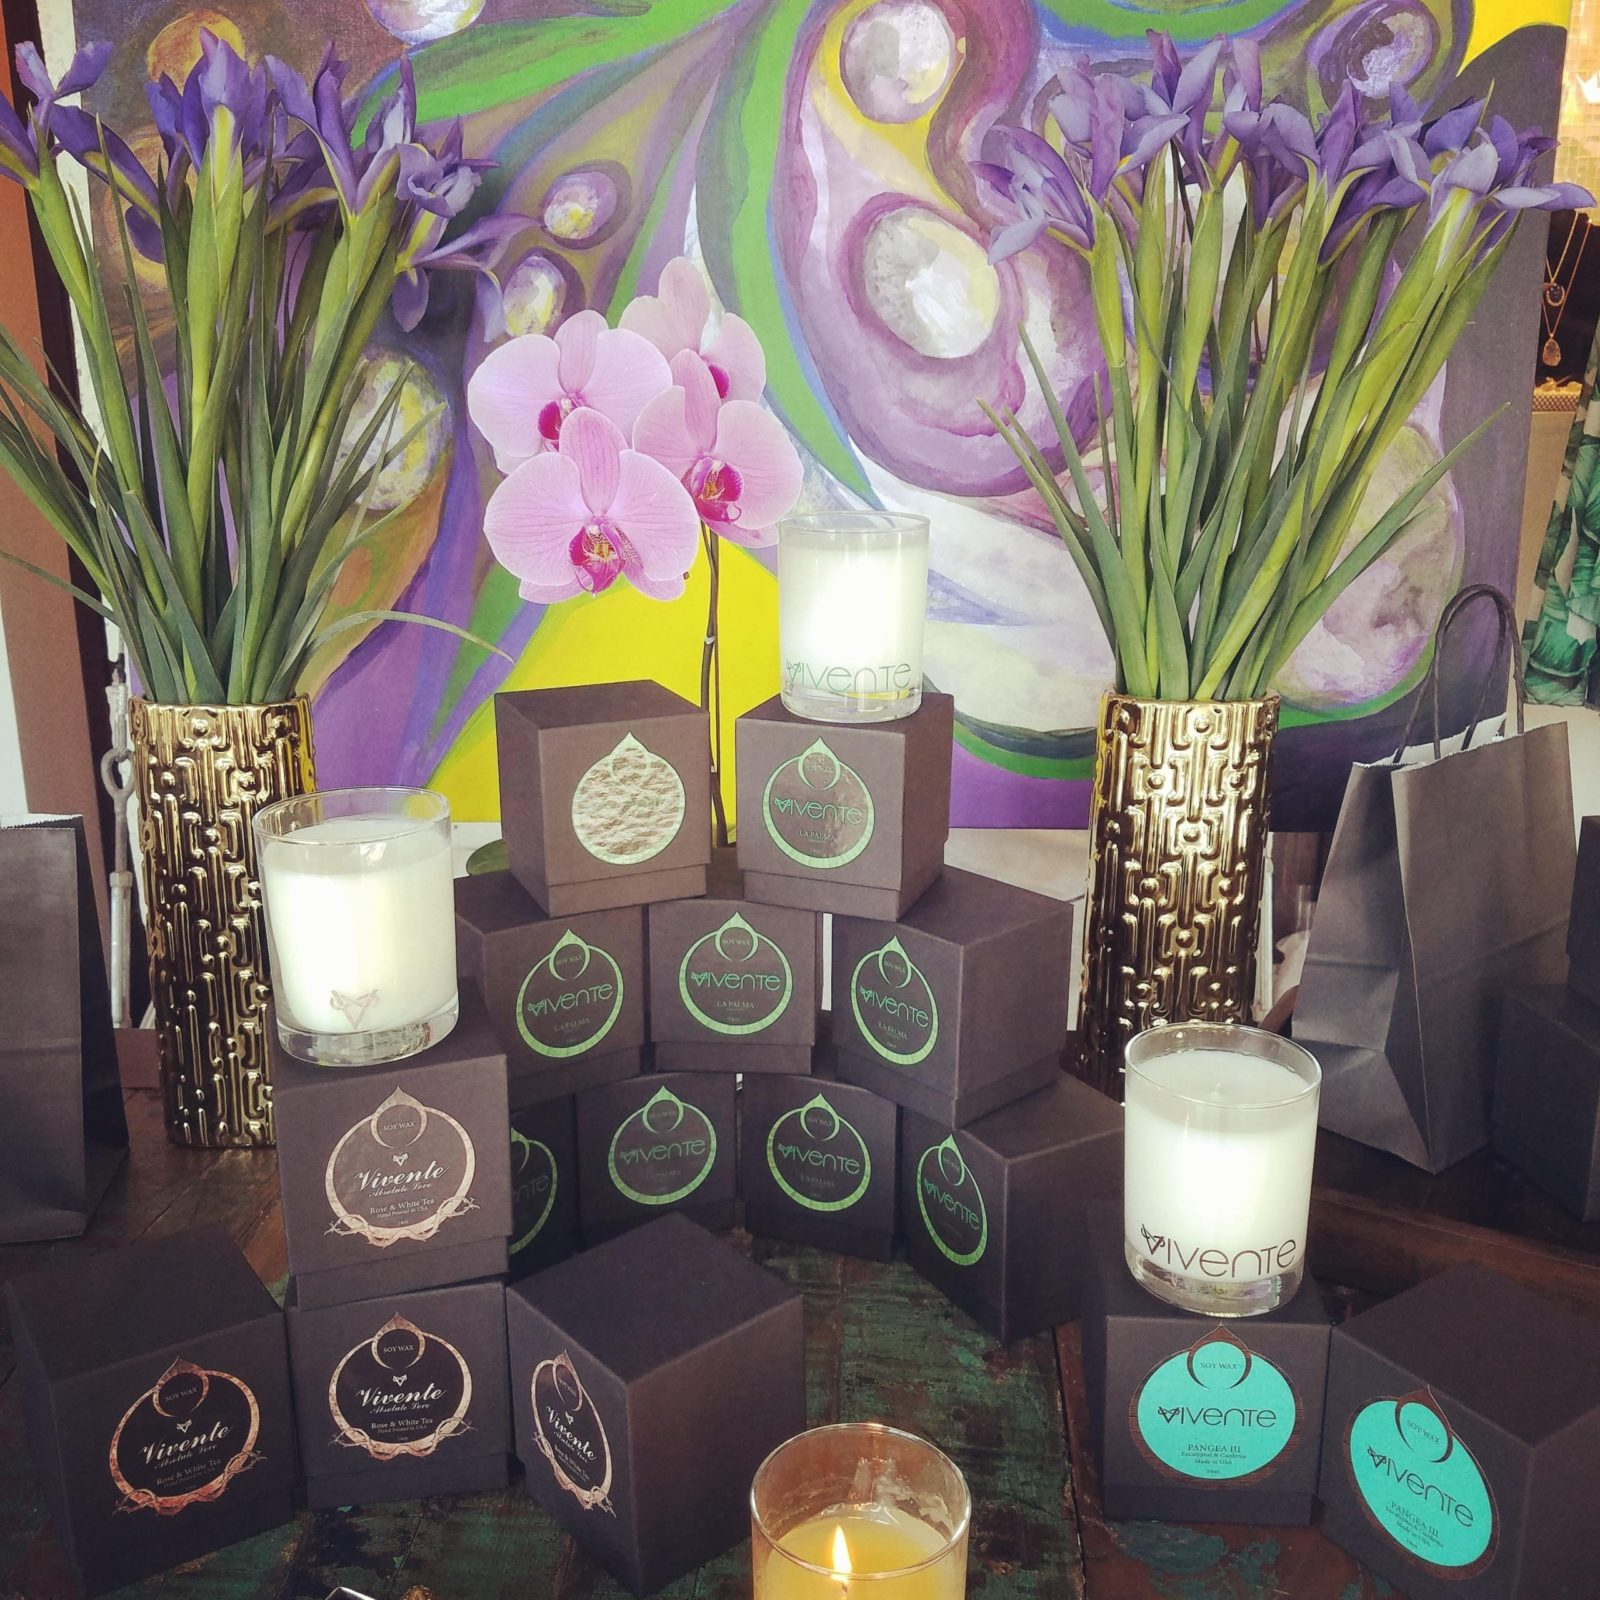 IMG 20180313 173939 723 scaled - Disfruta de las maravillosas velas Vivente